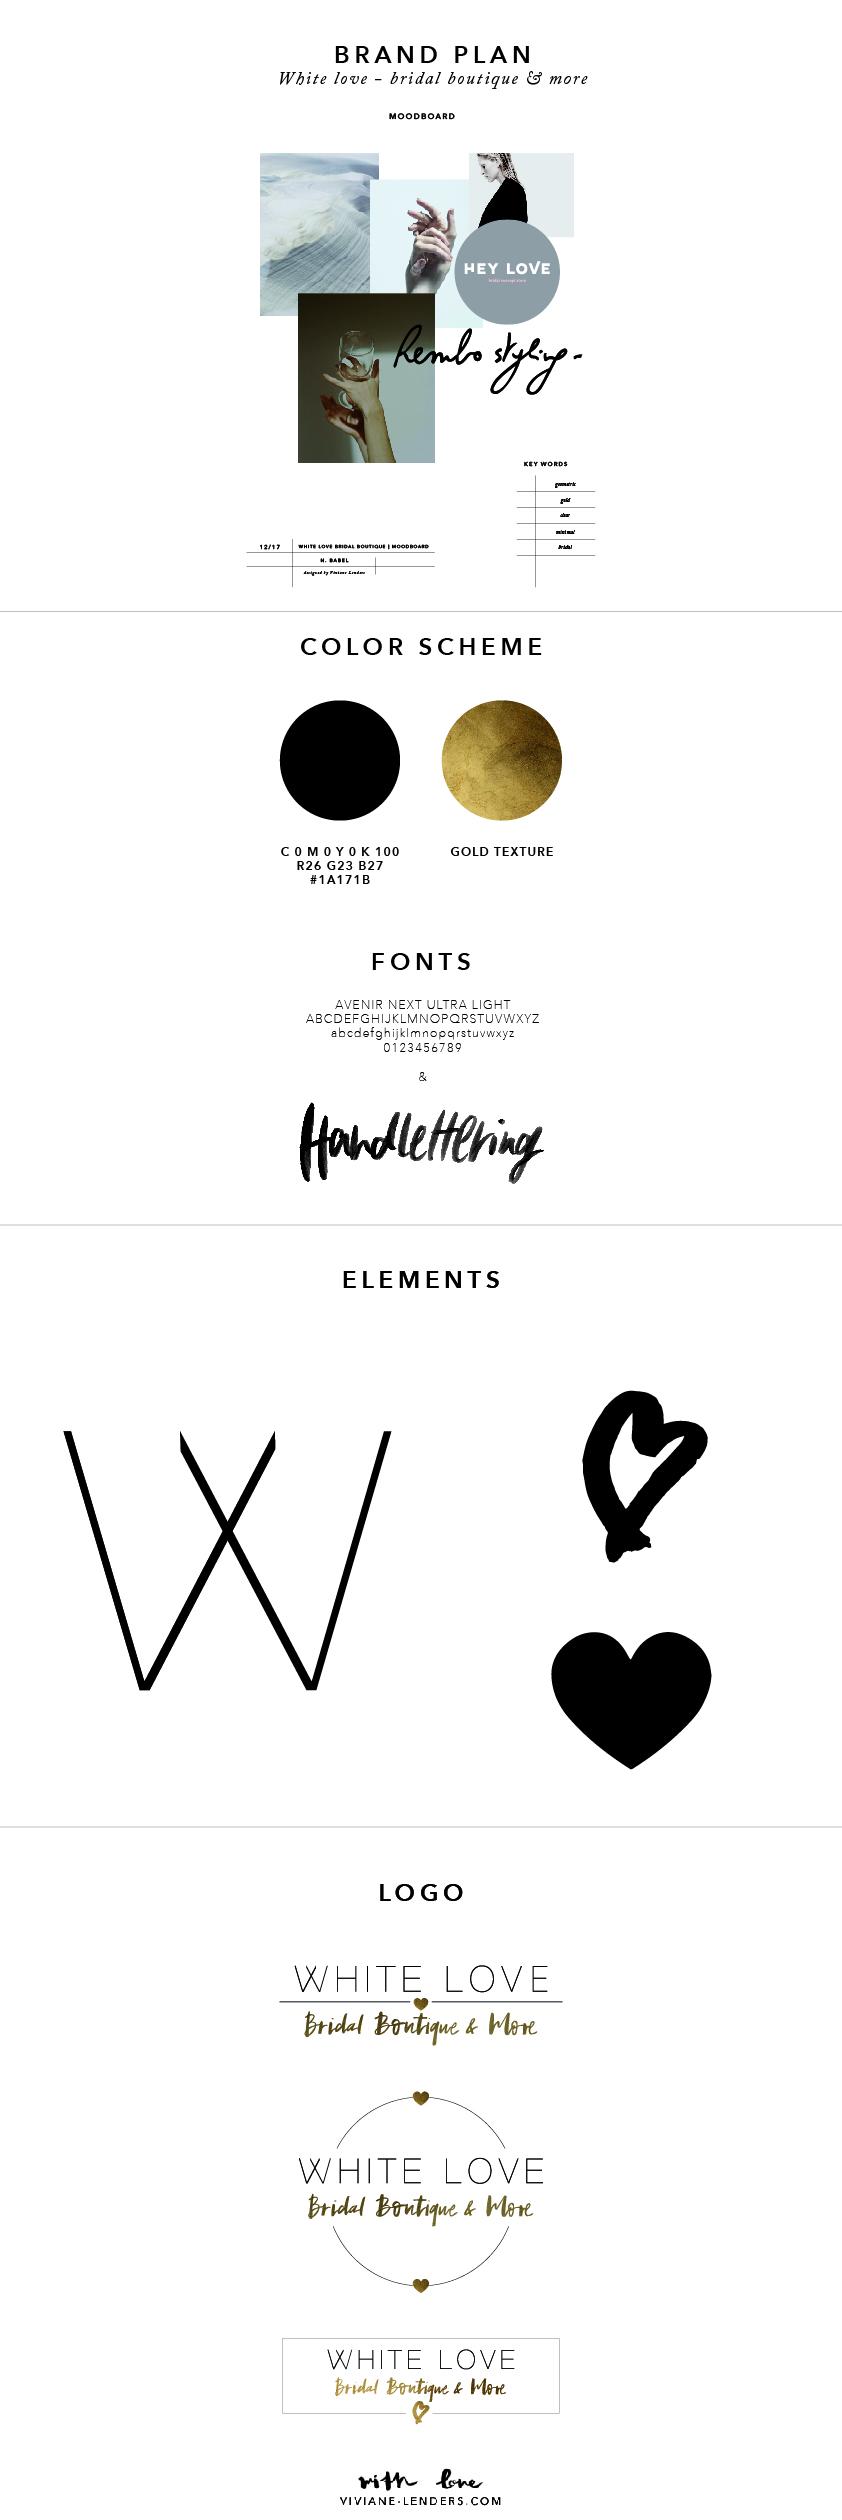 Brand-Plan_White-Love-Overview-01.jpg